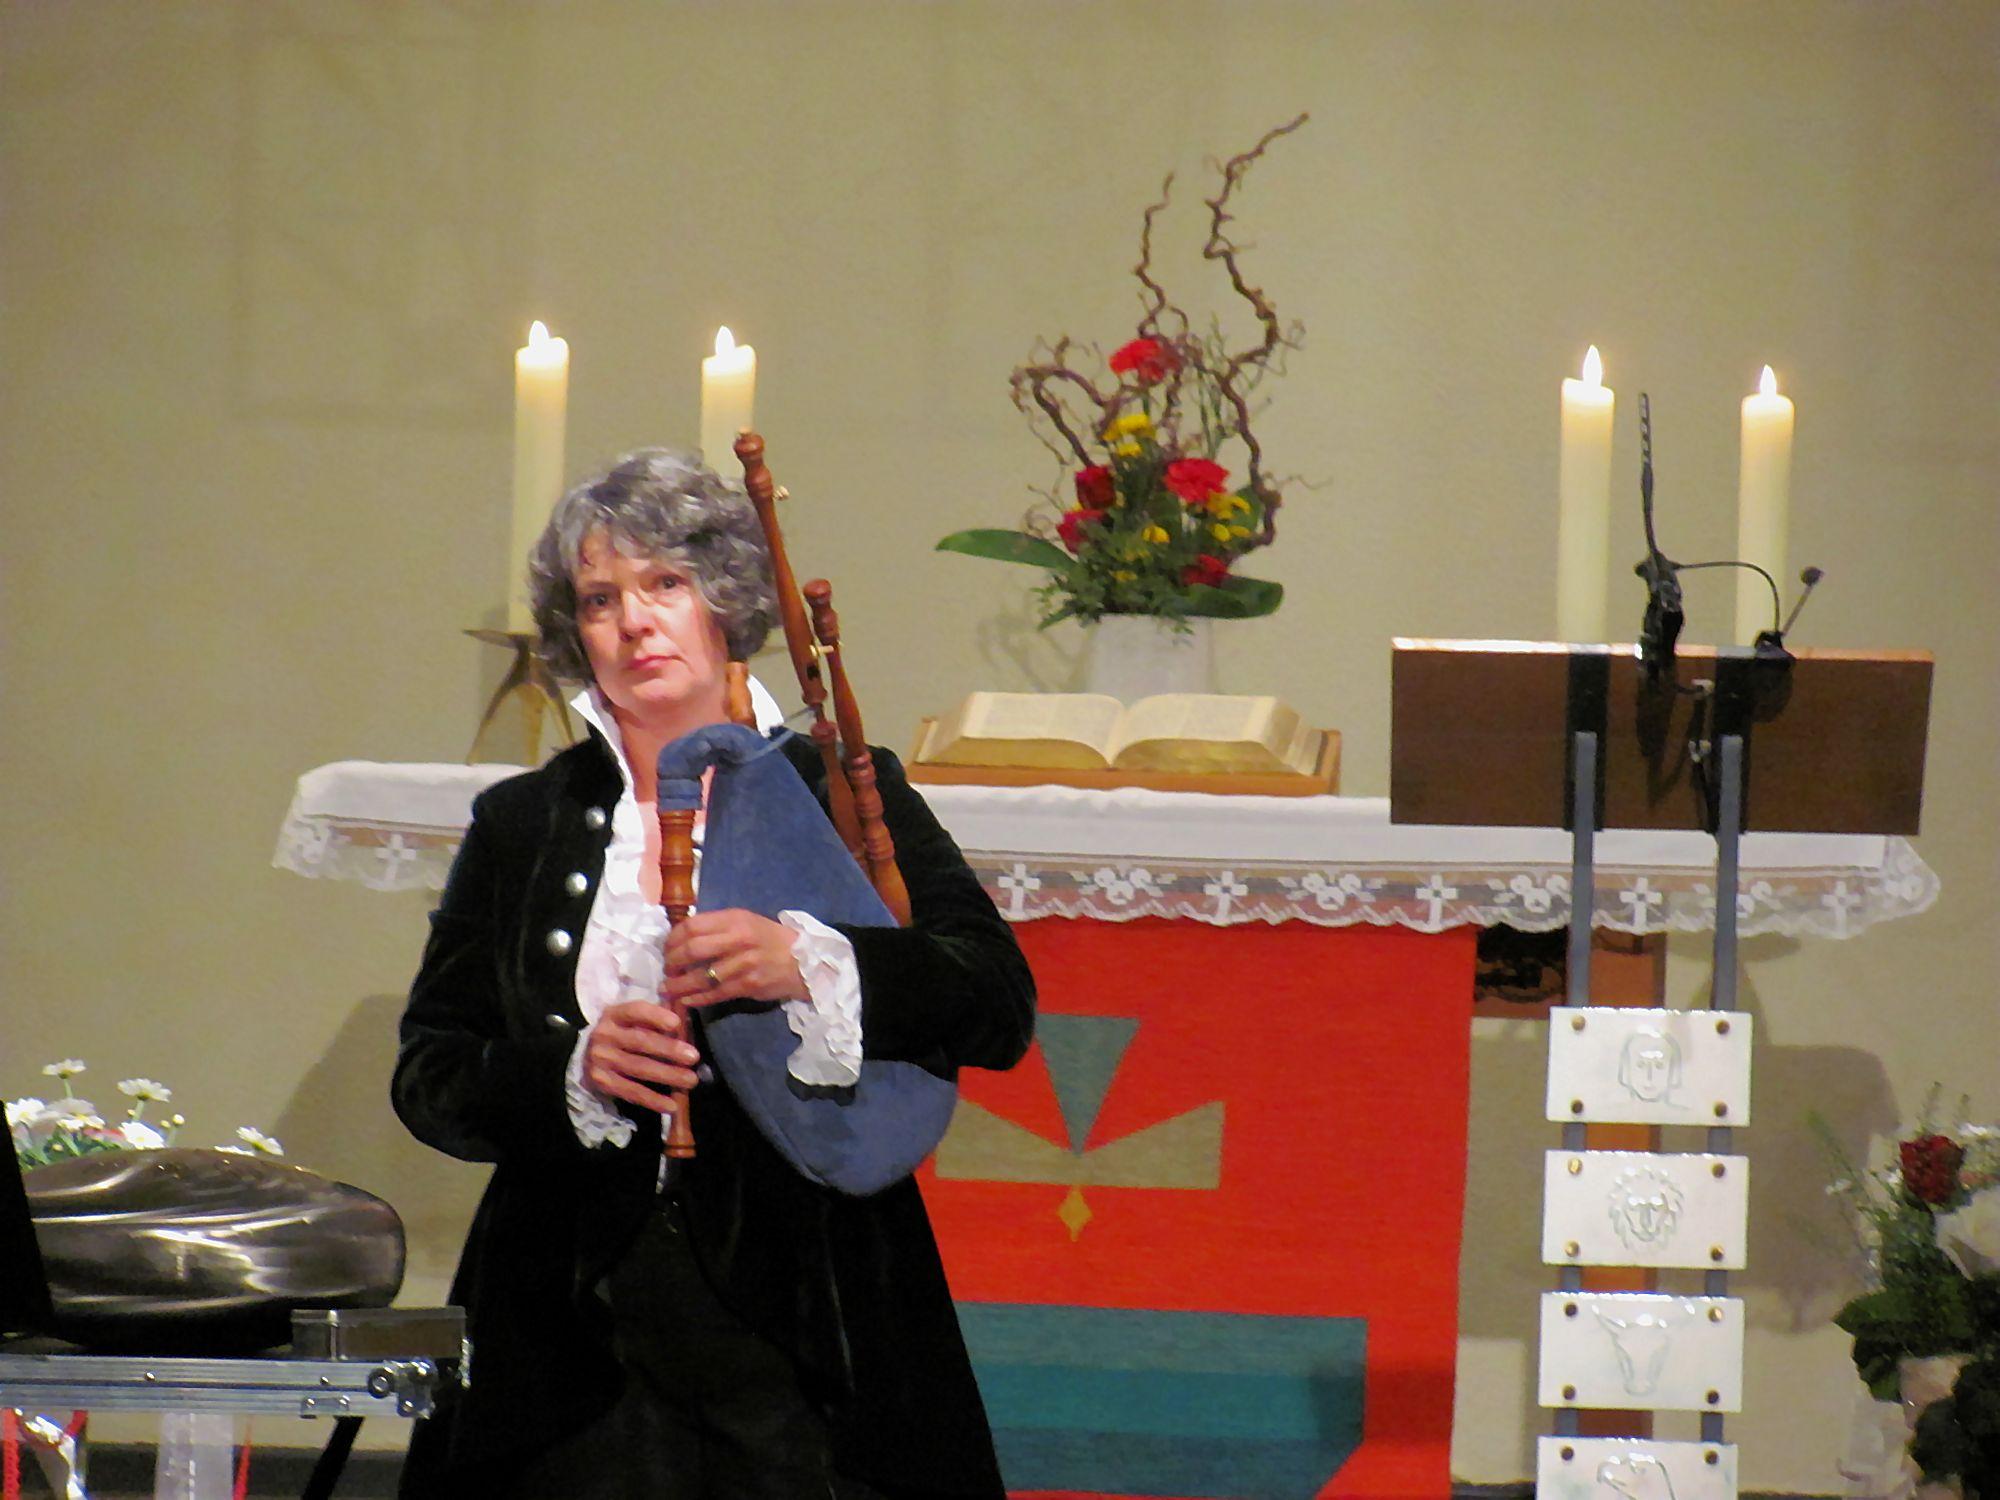 Katharina Götz